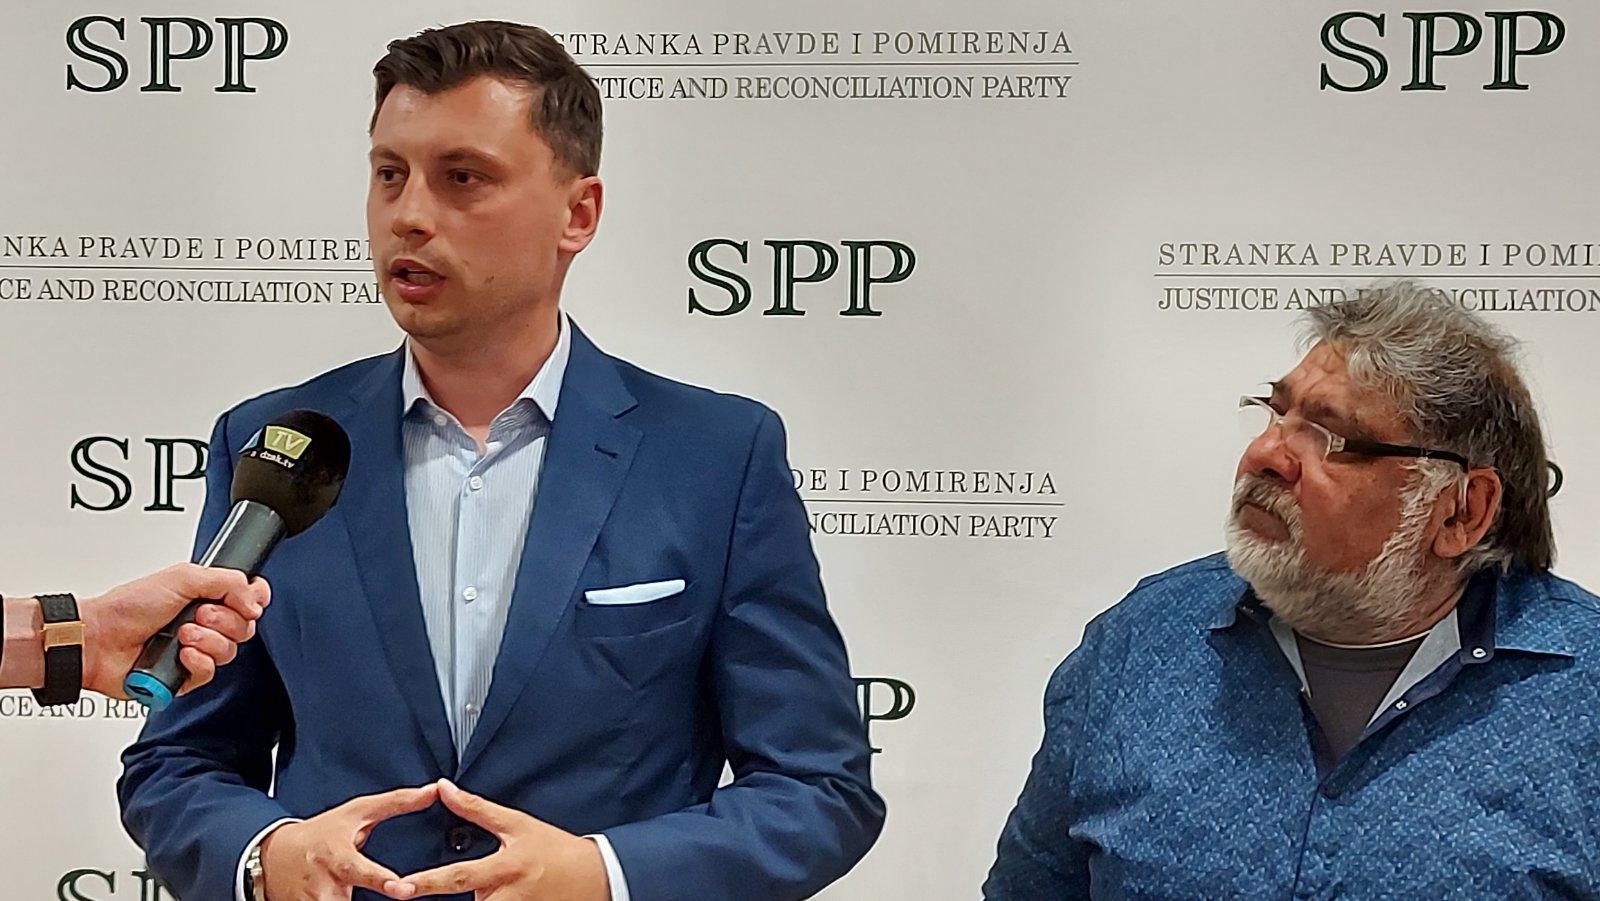 1 14 - Građanski pokret Roma Srbije dao podršku Stranci pravde i pomirenja